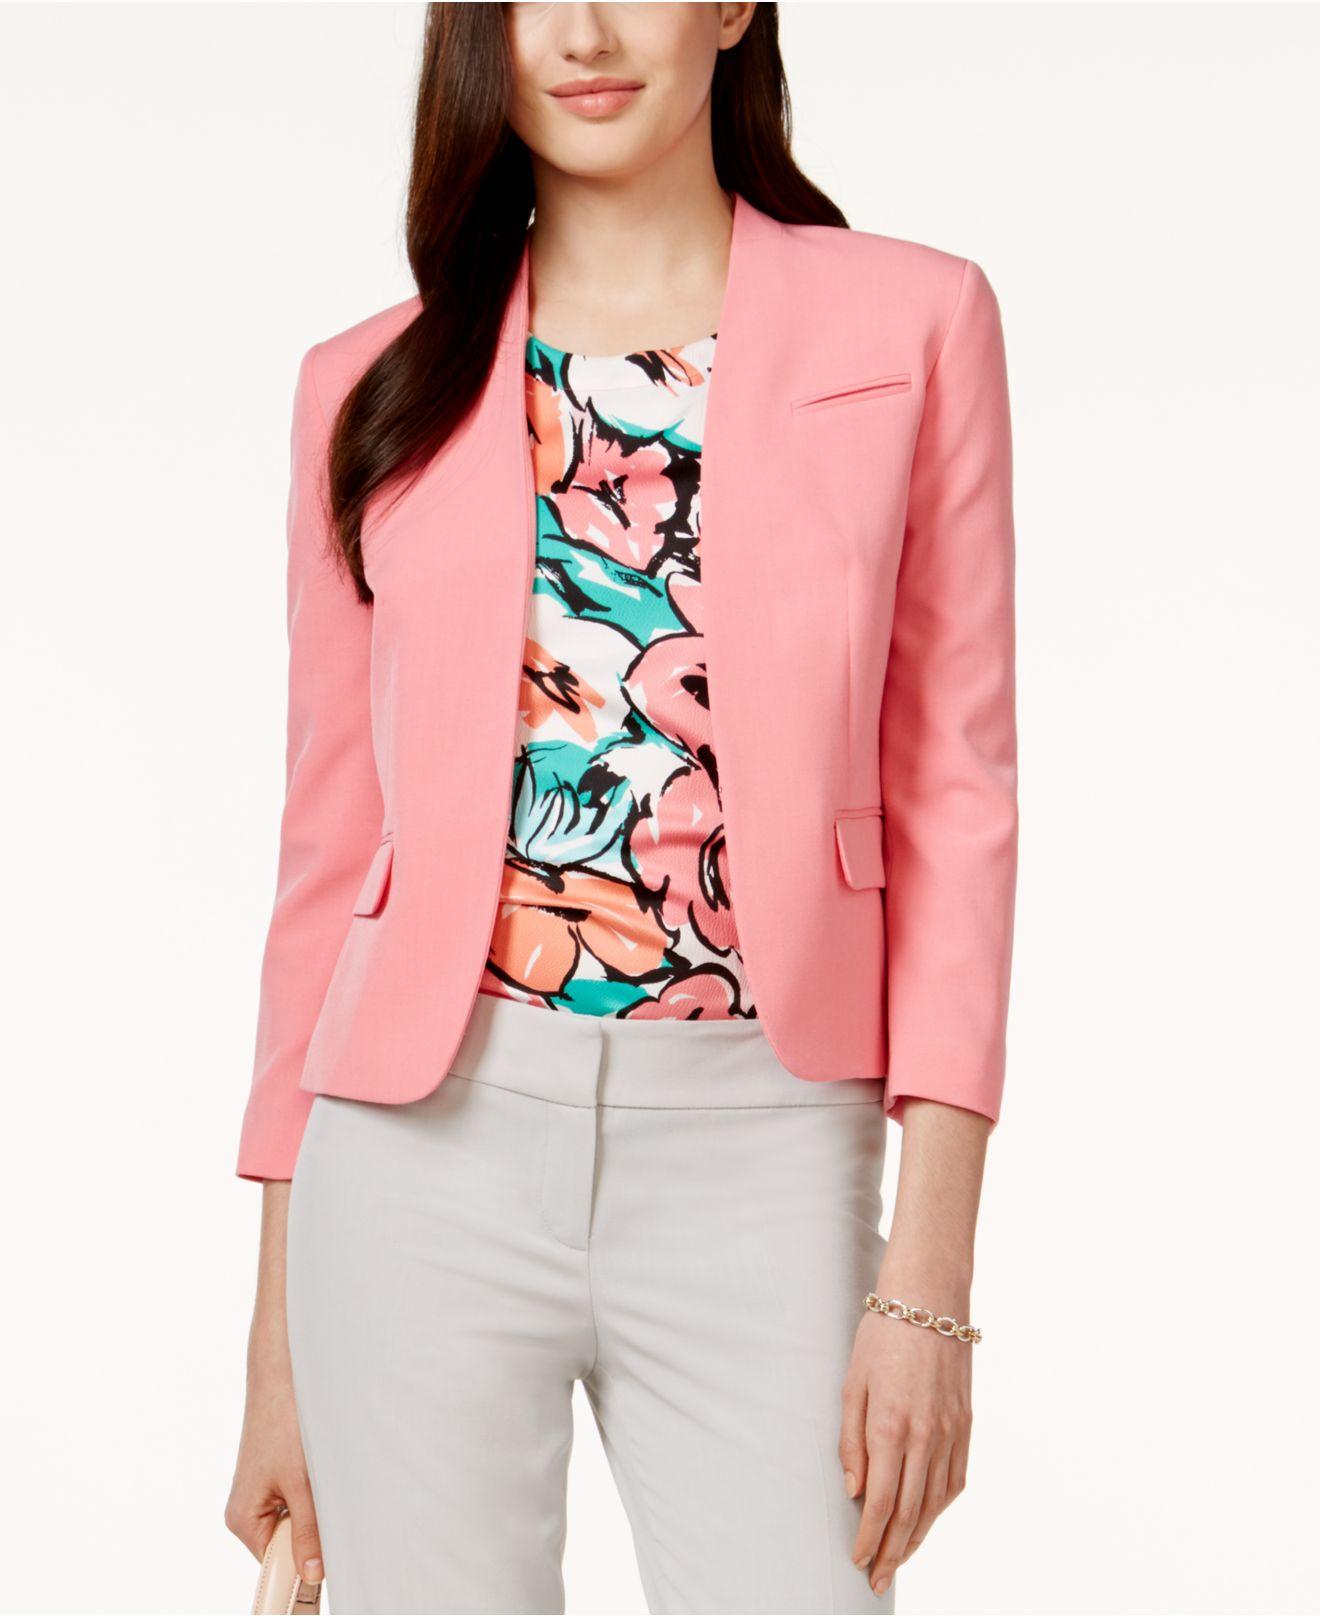 Nine west Three-quarter-sleeve Collarless Jacket in Pink | Lyst